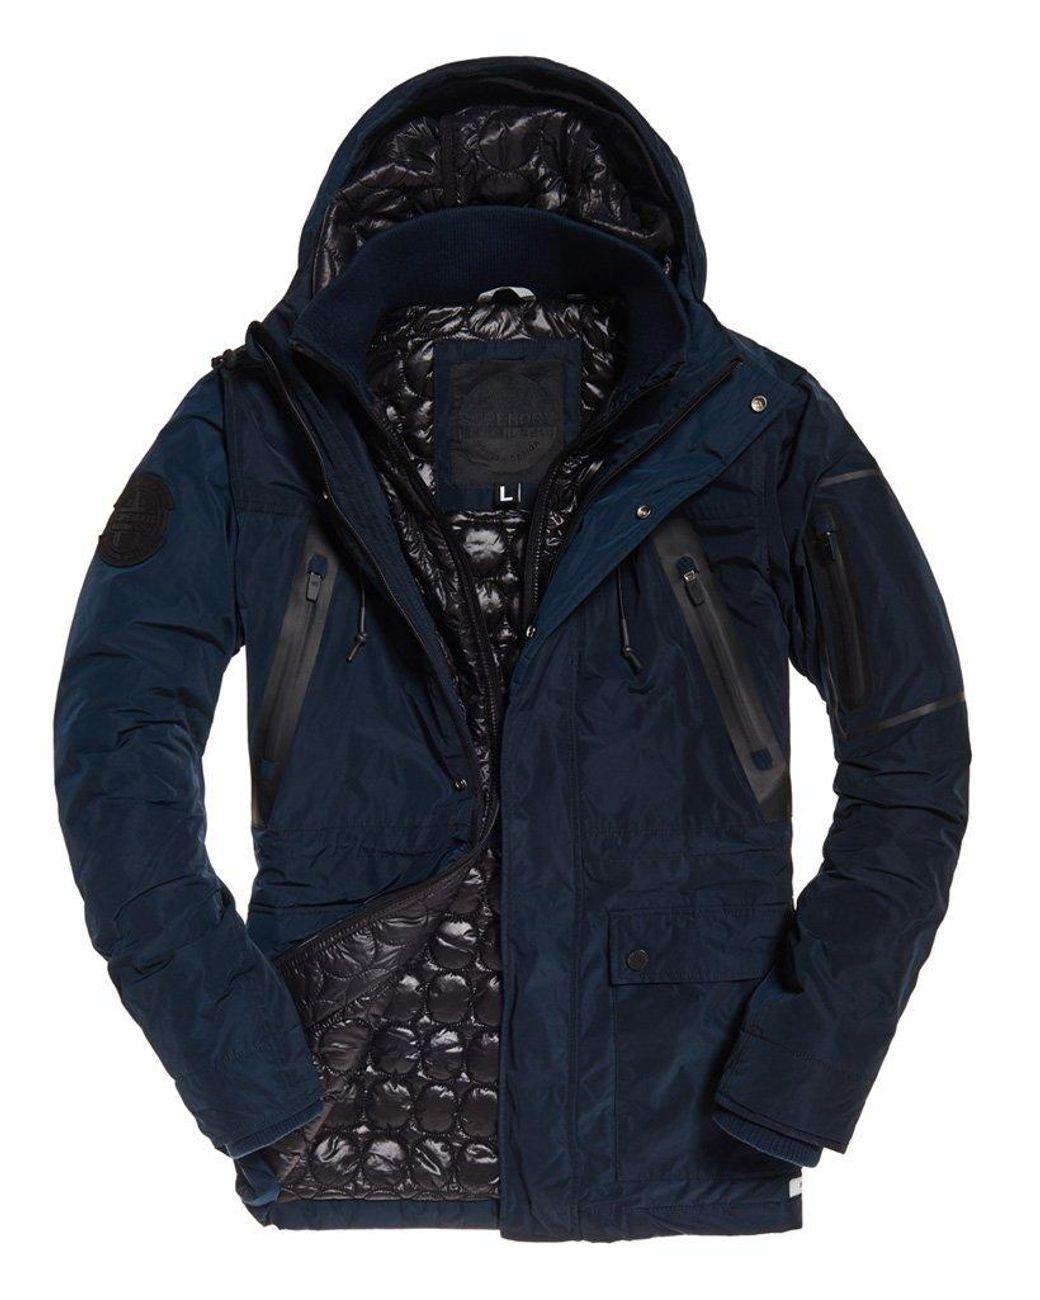 T Tahari Maya Packable Zoey Ruffled Puffer coat Jacket Navy